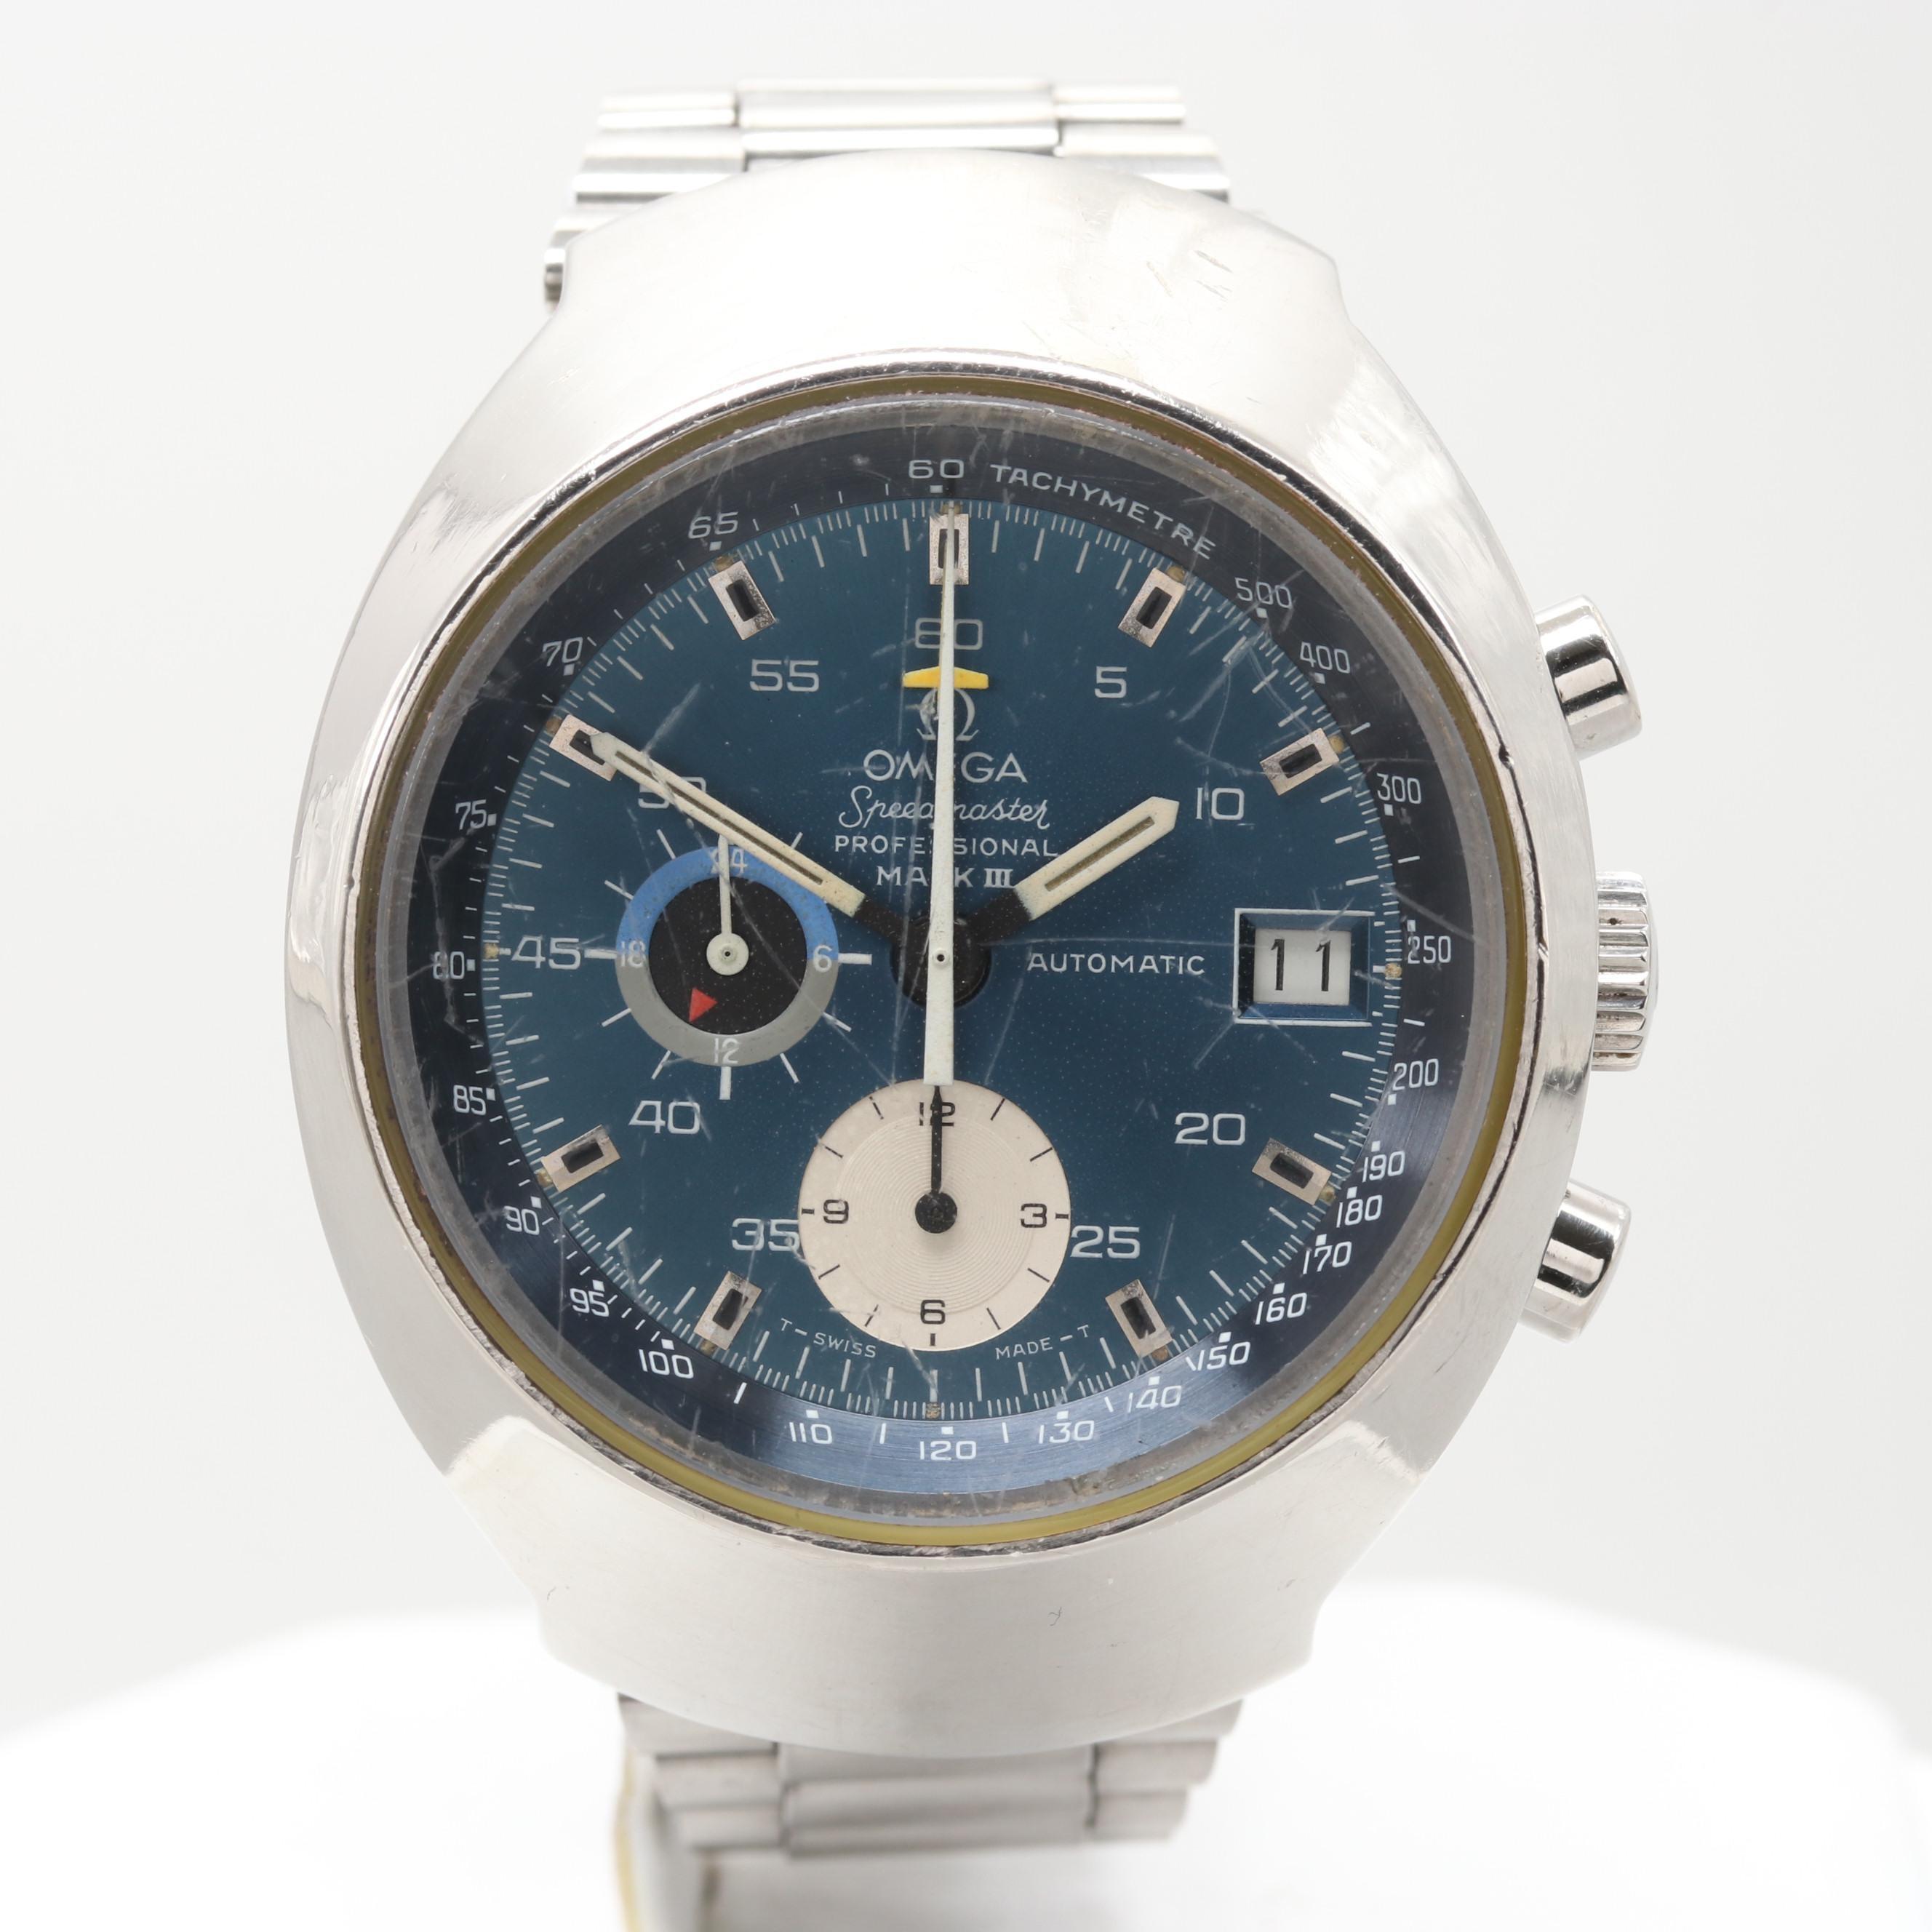 Vintage Omega Speedmaster MK III Automatic Chronograph Wristwatch